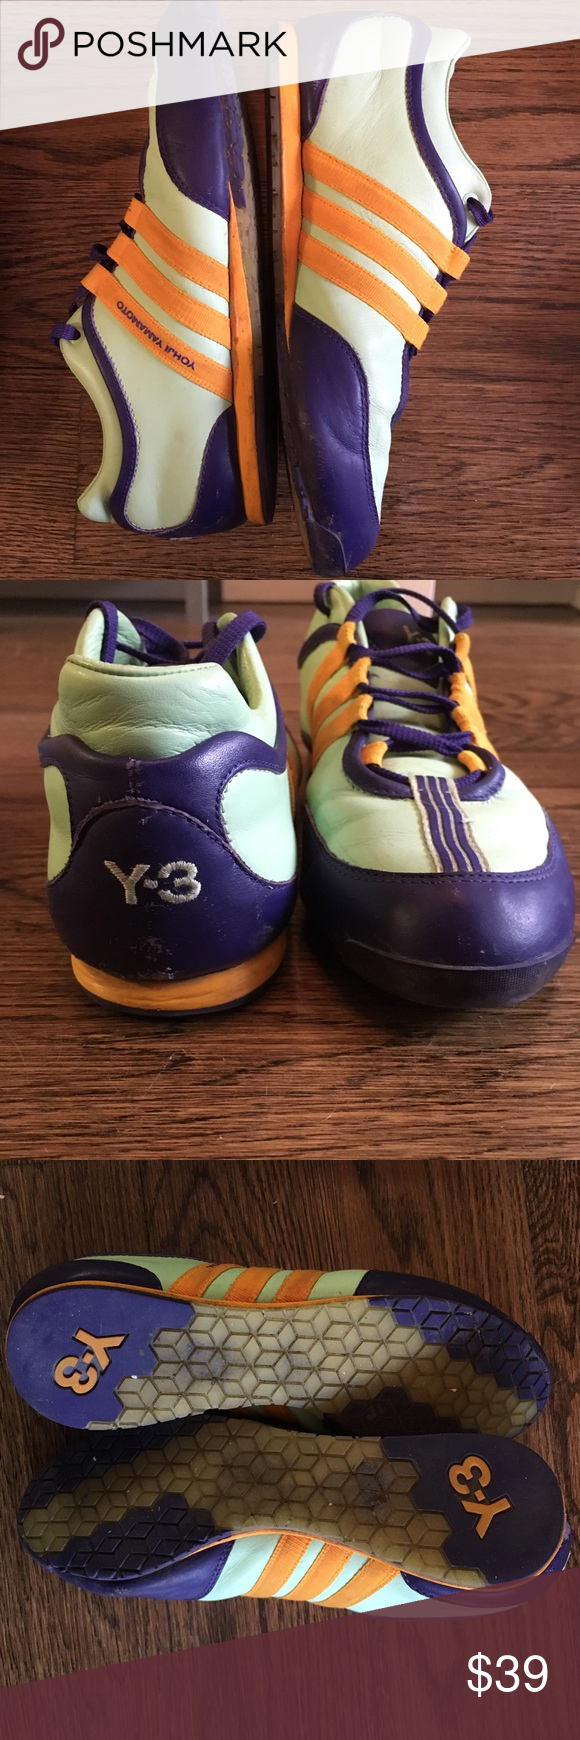 Adidas Y | 3 Boxeo Yohji Yamamoto Adidas Boxeo Sneakers | 54e987d - itorrent.site